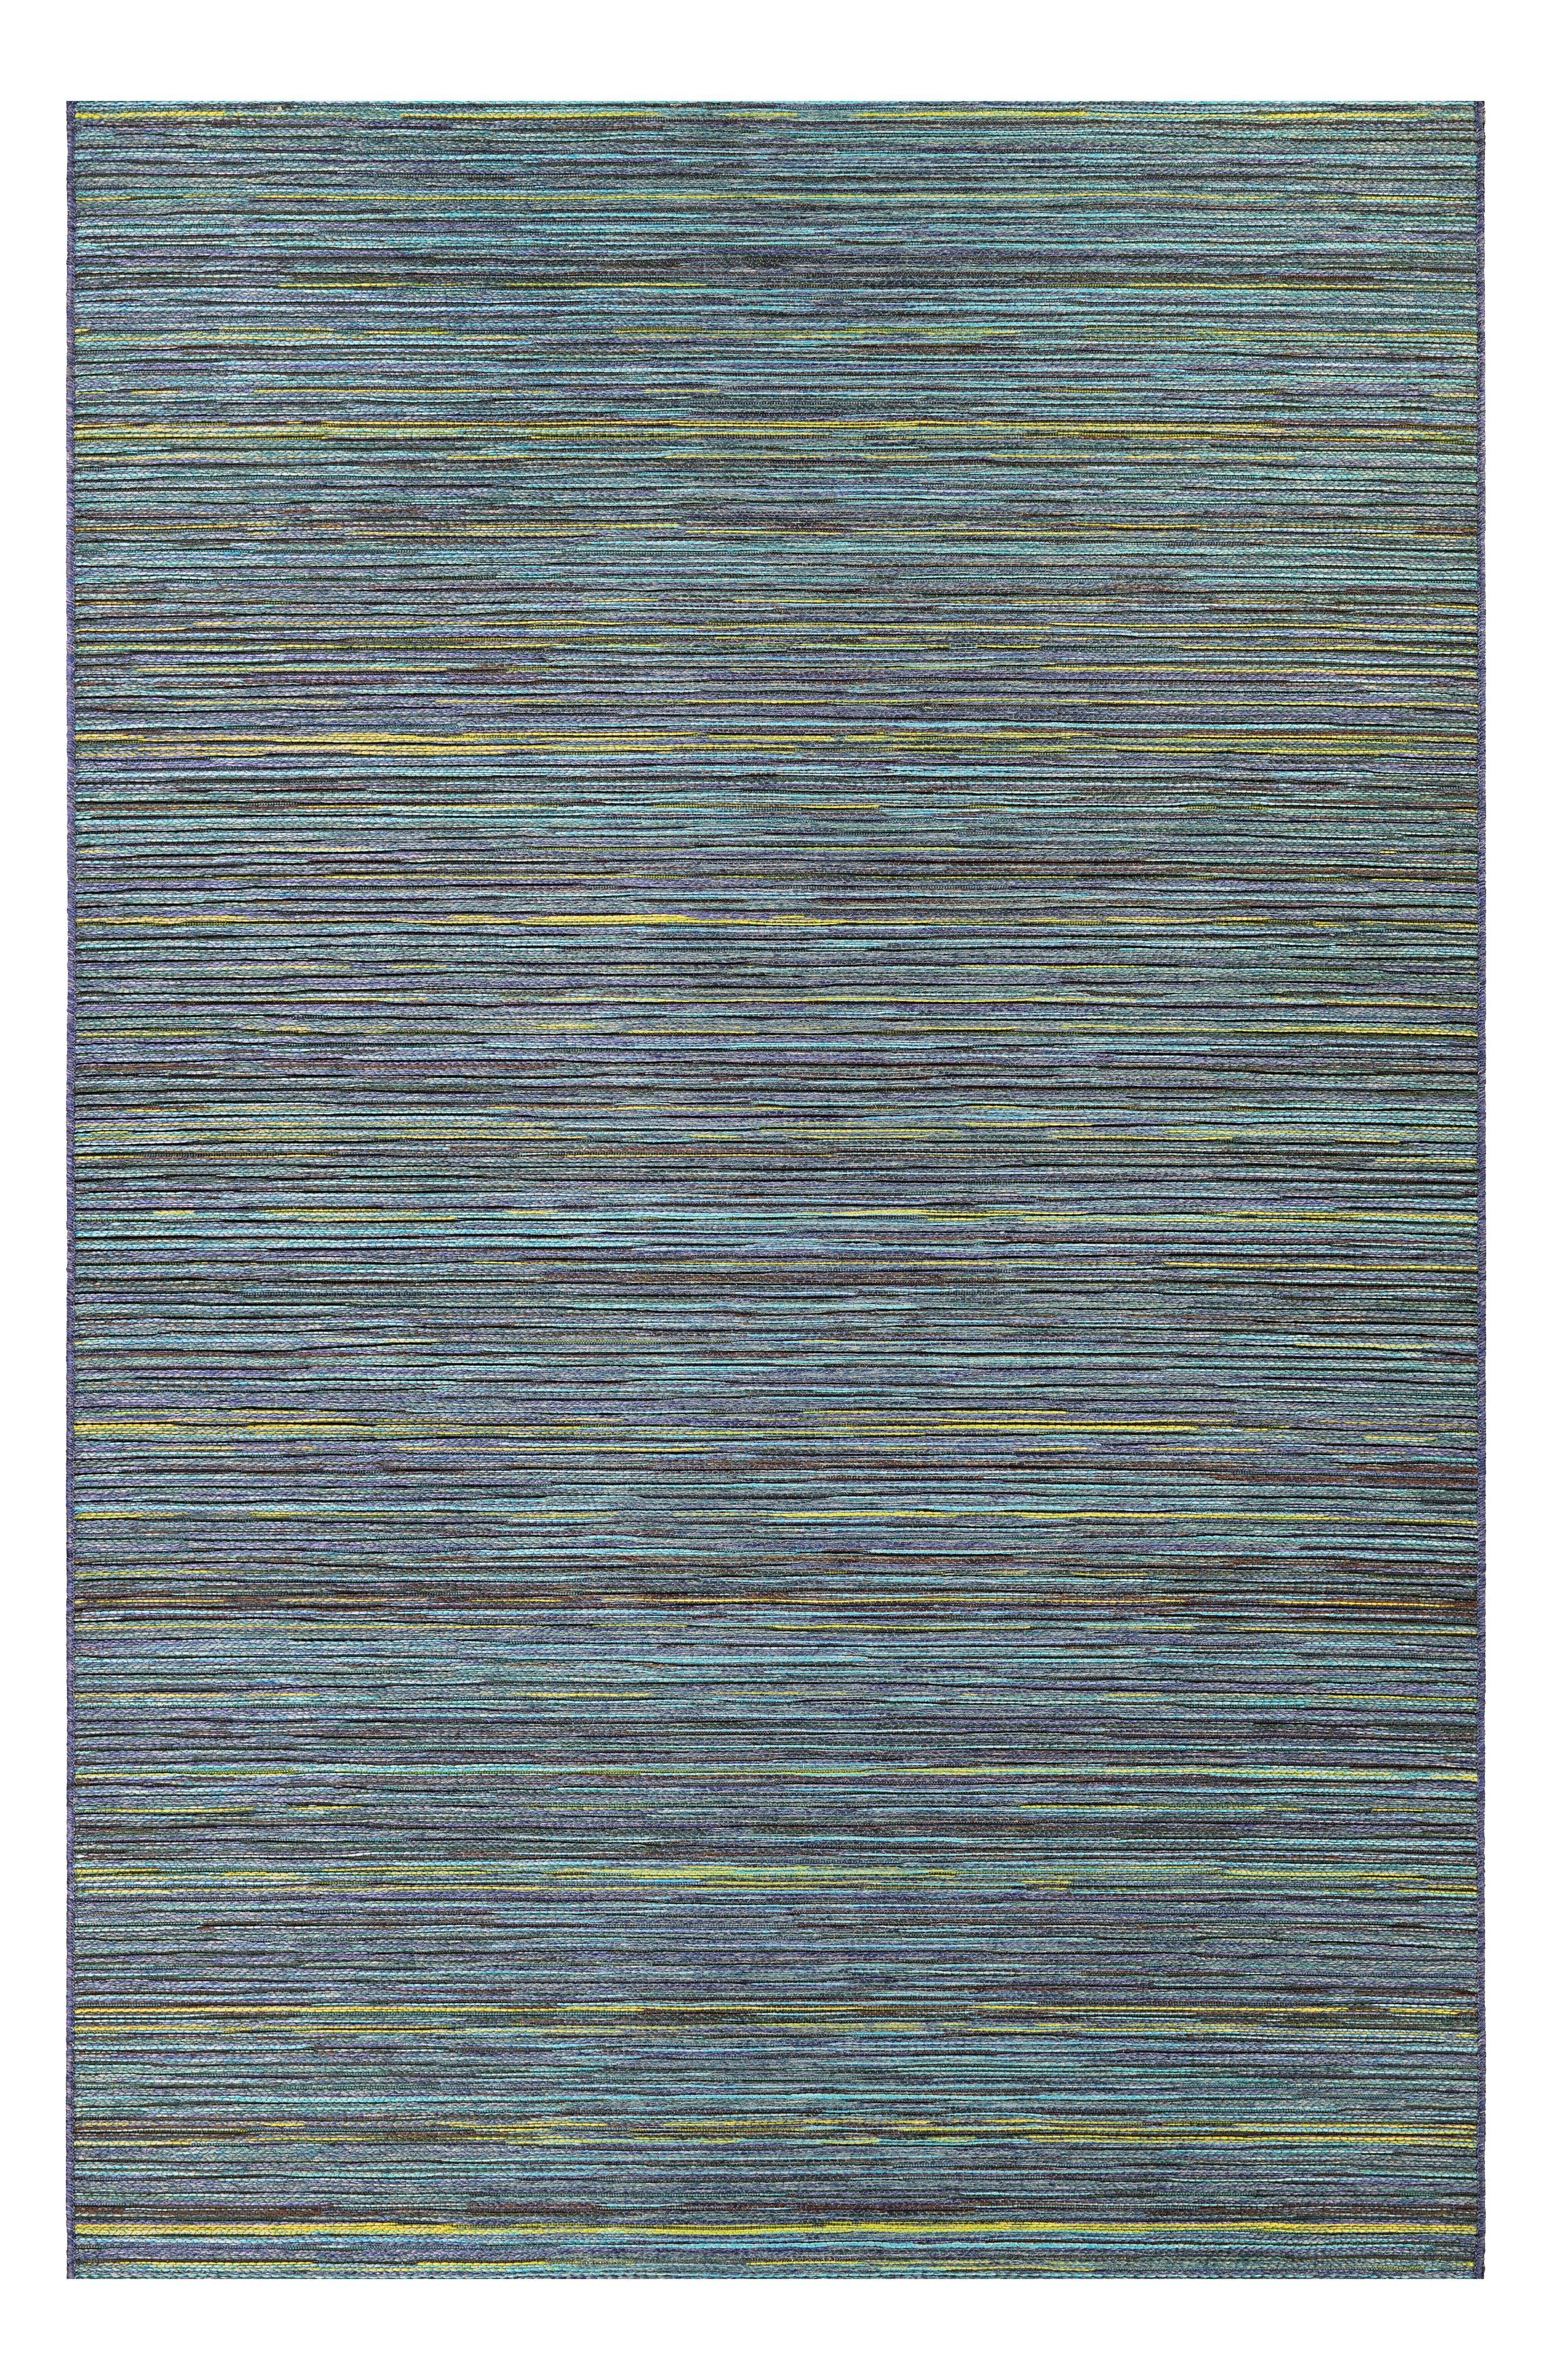 Hinsdale Indoor/Outdoor Rug,                         Main,                         color, Teal/ Cobalt